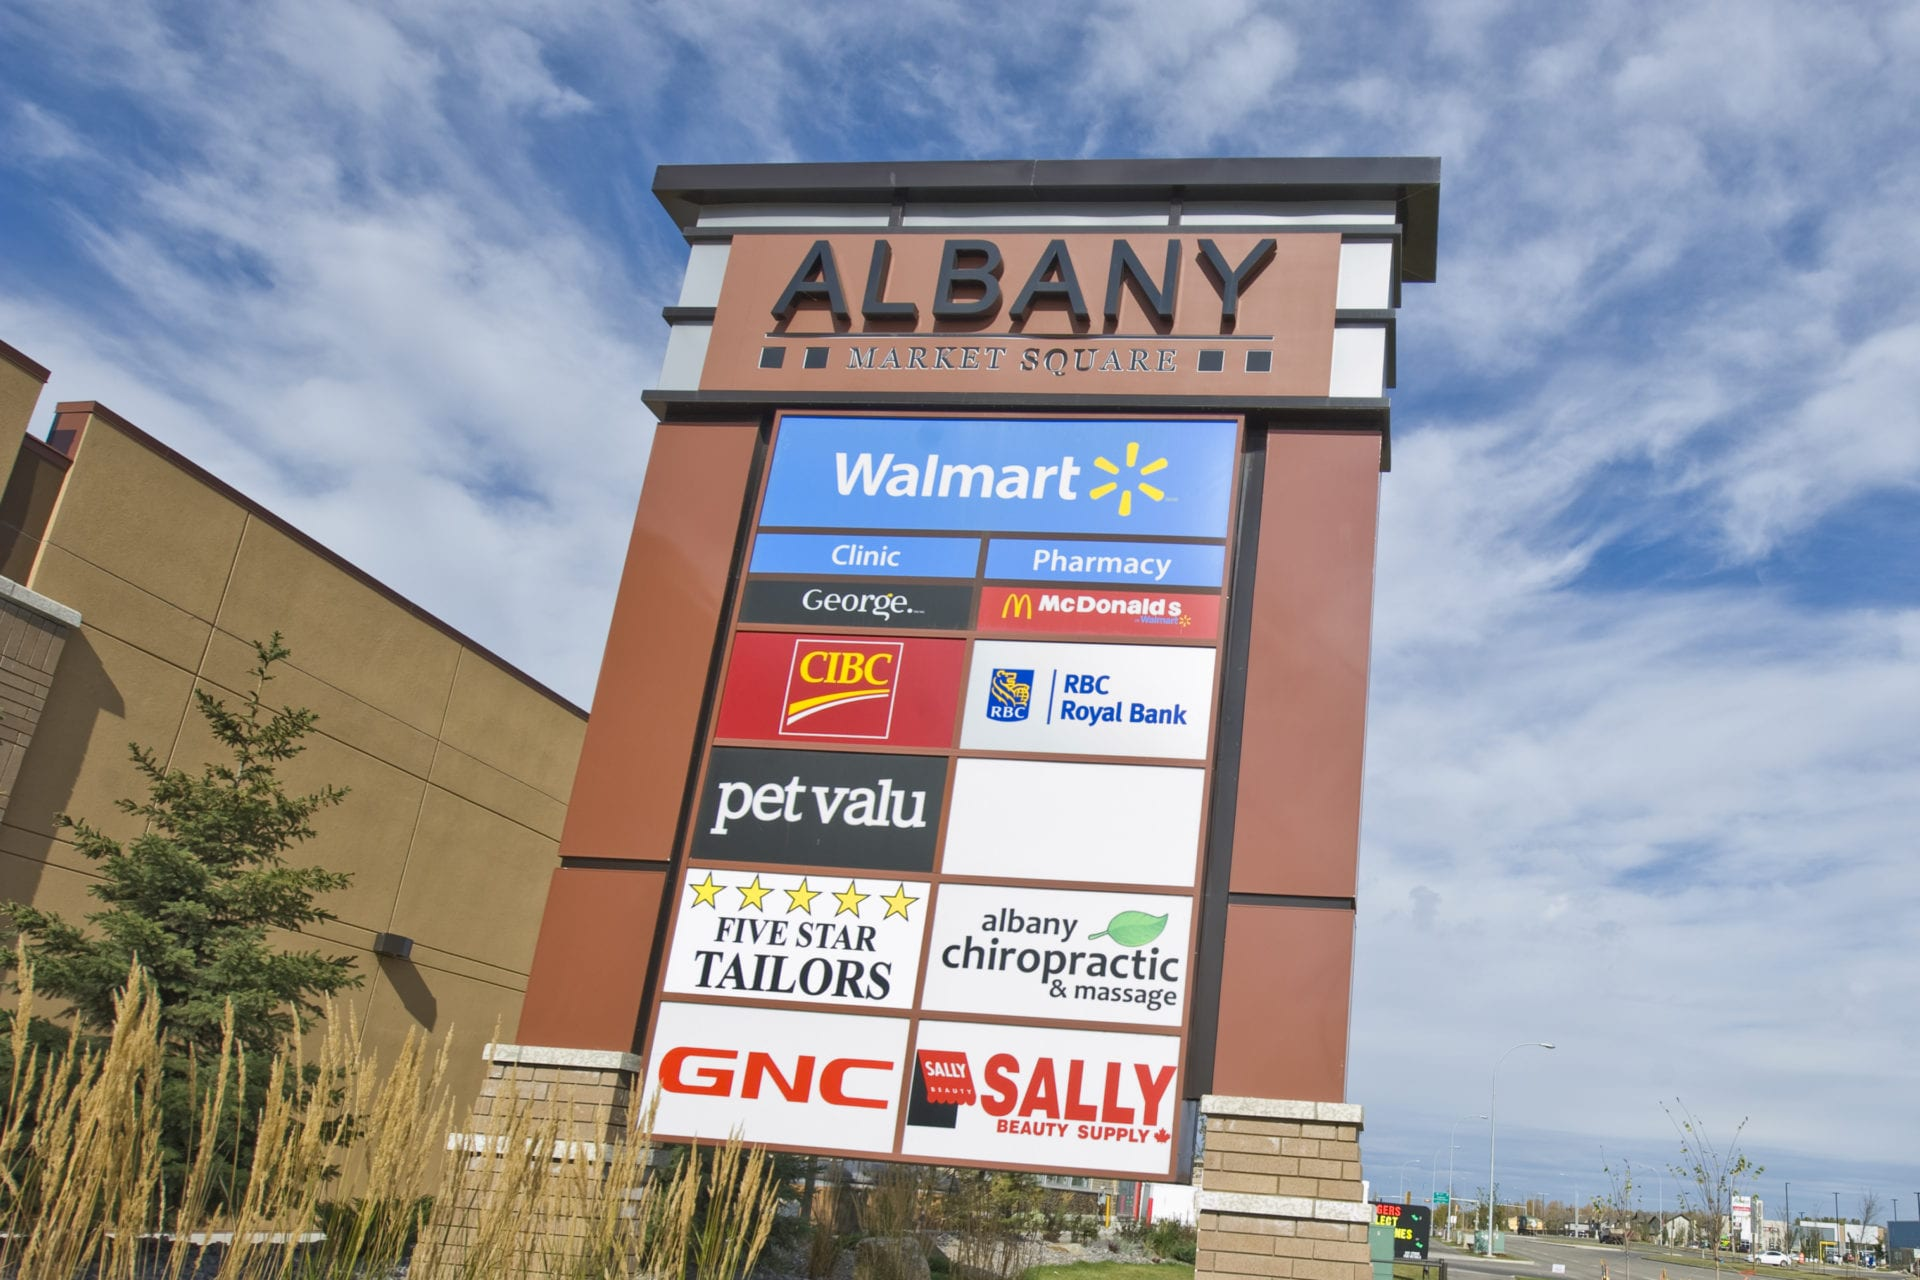 Albany Market Square